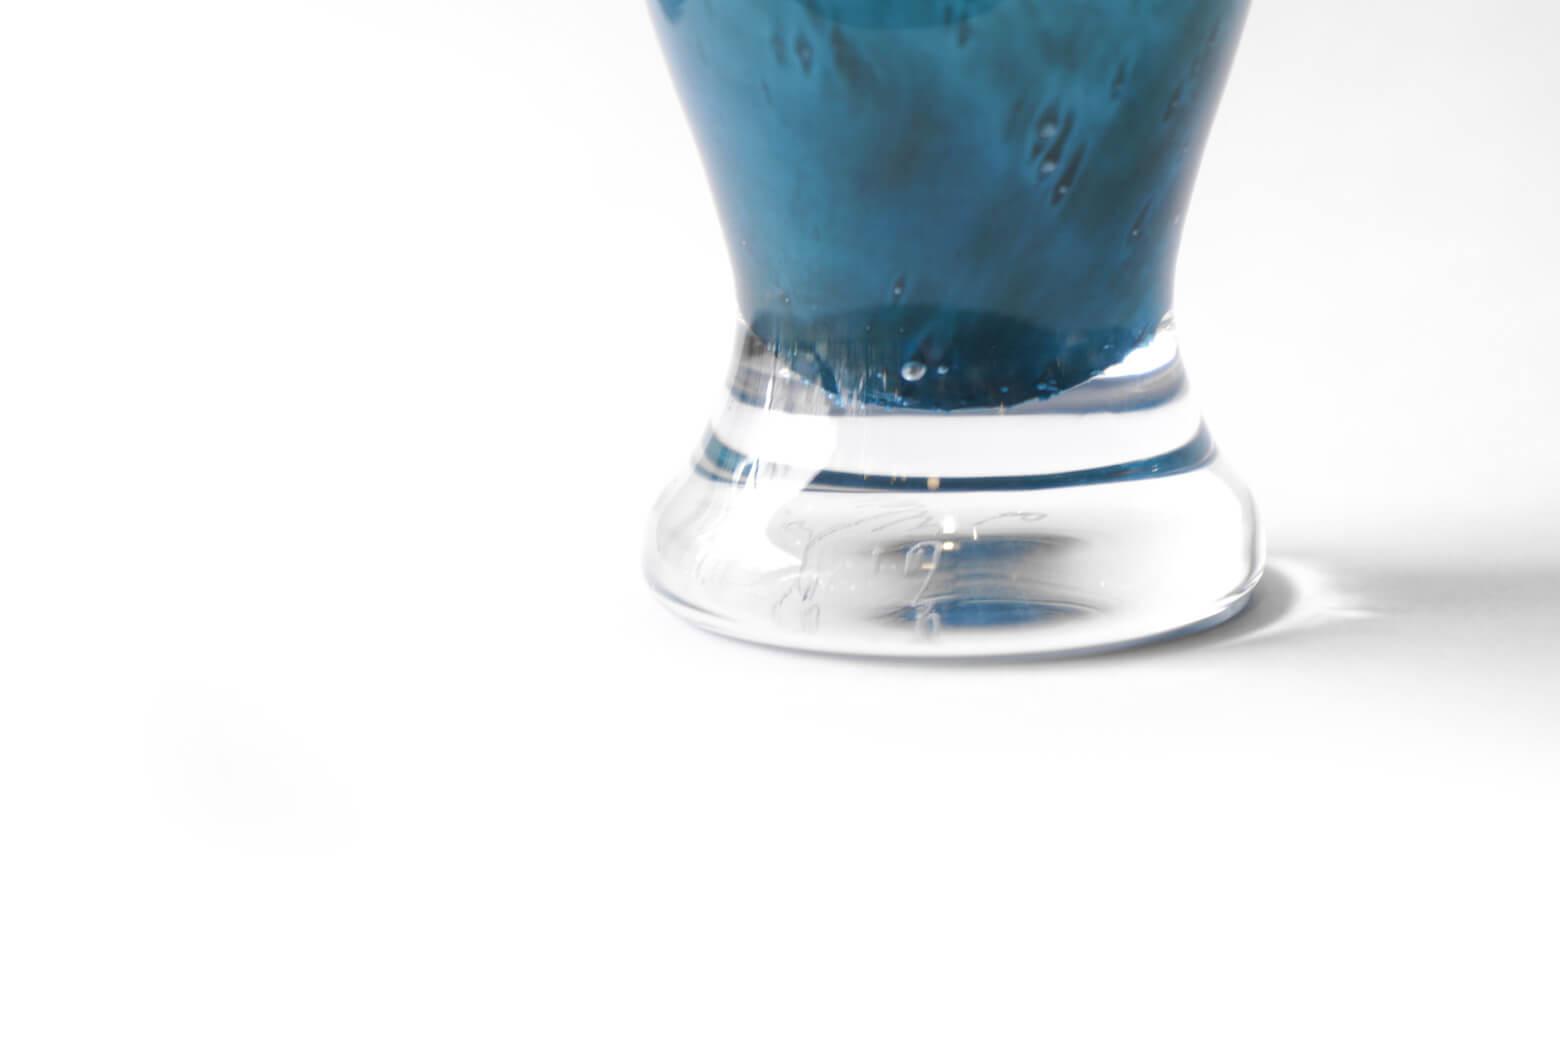 Boda Afors Bertil Vallien Miniature Vase/バーティル・ヴァリーン ボダ ミニチュア ベース ガラス 北欧雑貨